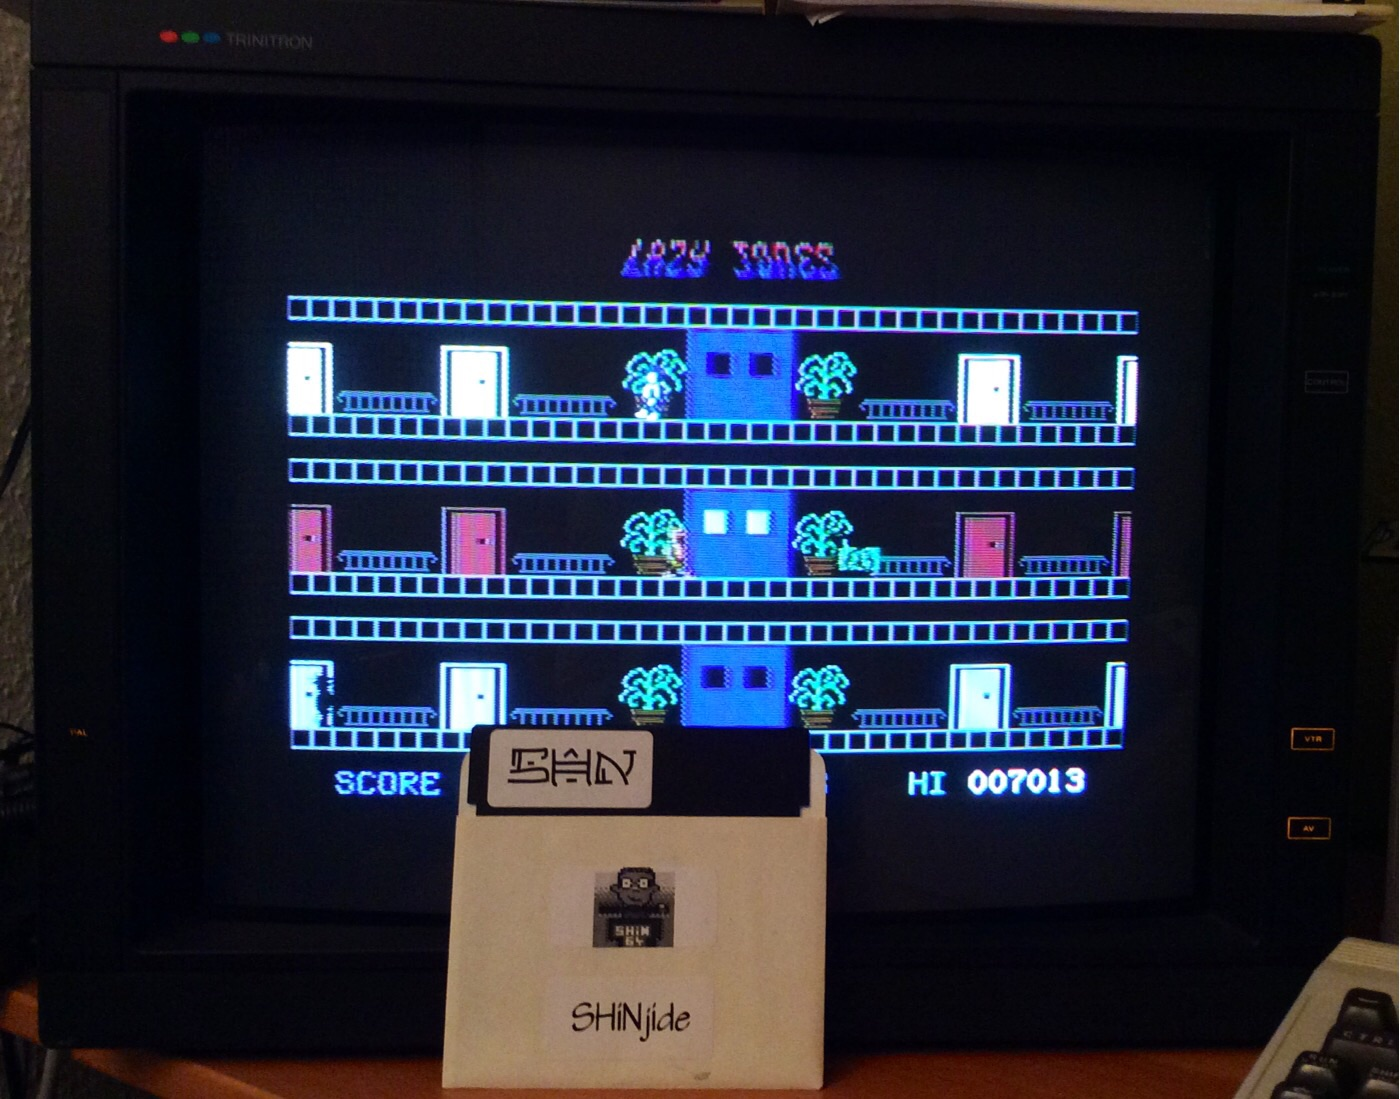 SHiNjide: Lazy Jones (Commodore 64) 7,013 points on 2014-12-15 13:57:08